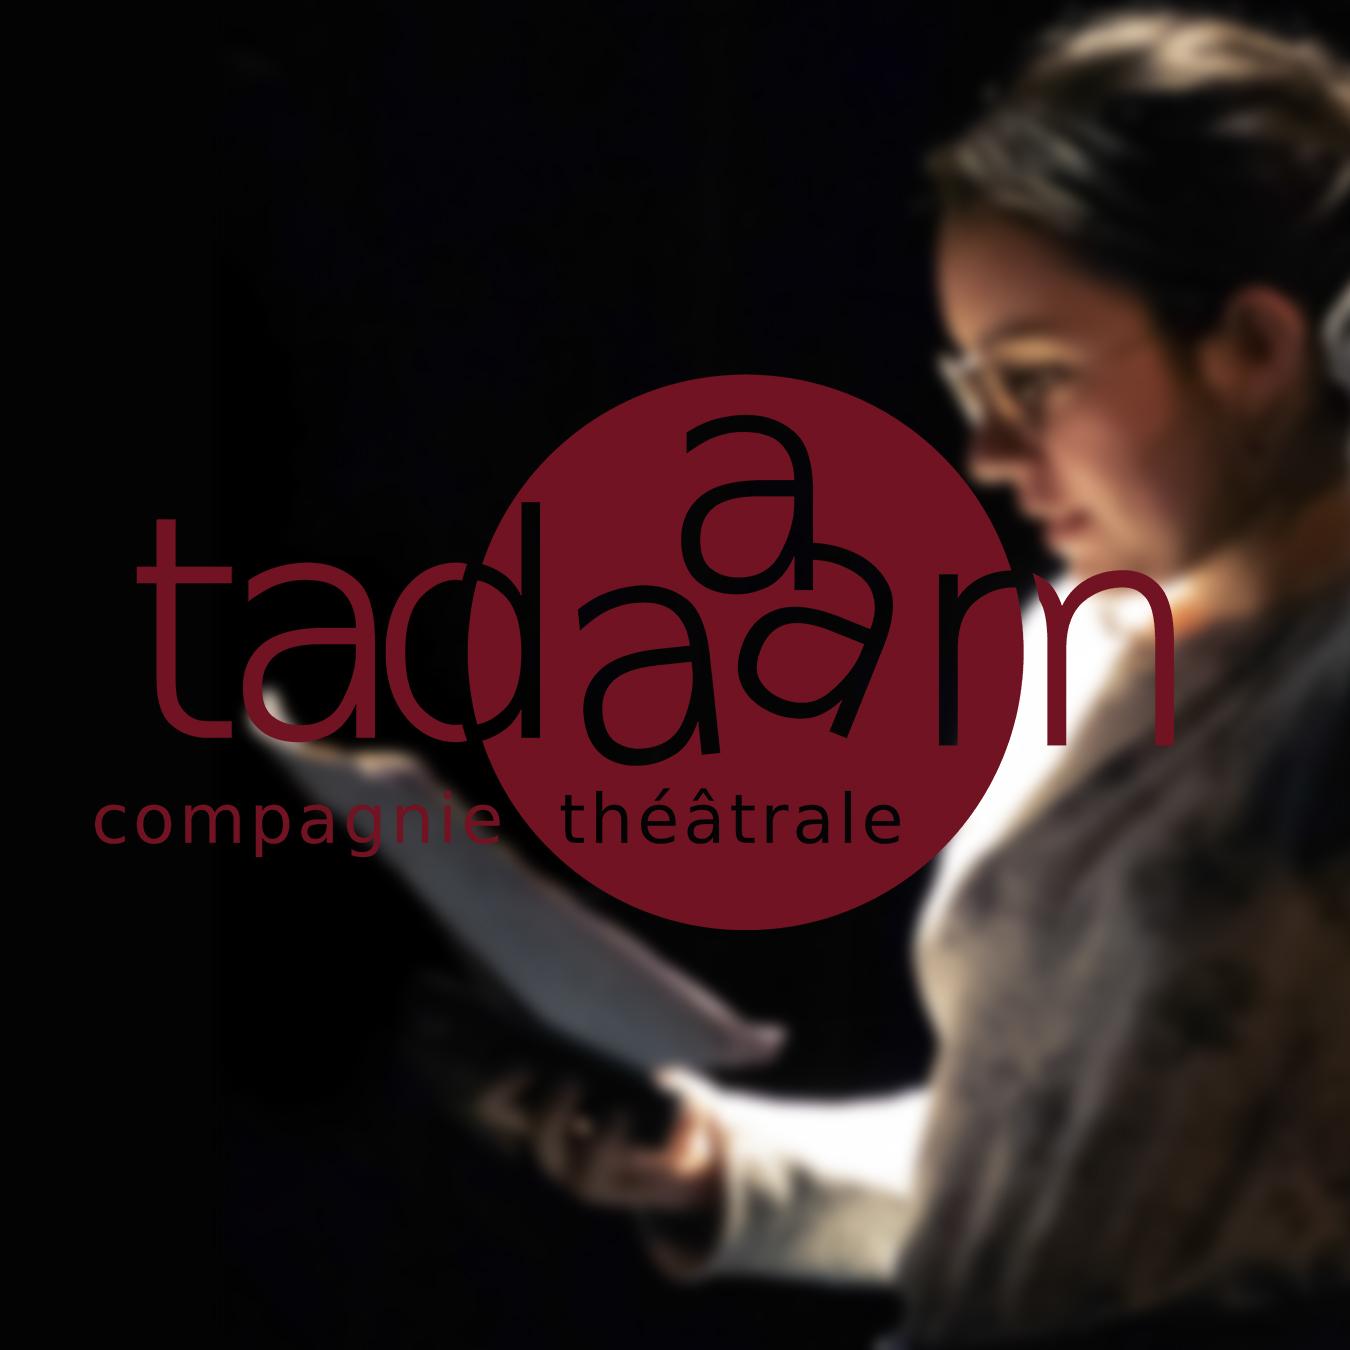 1 présentation logo Tadaam